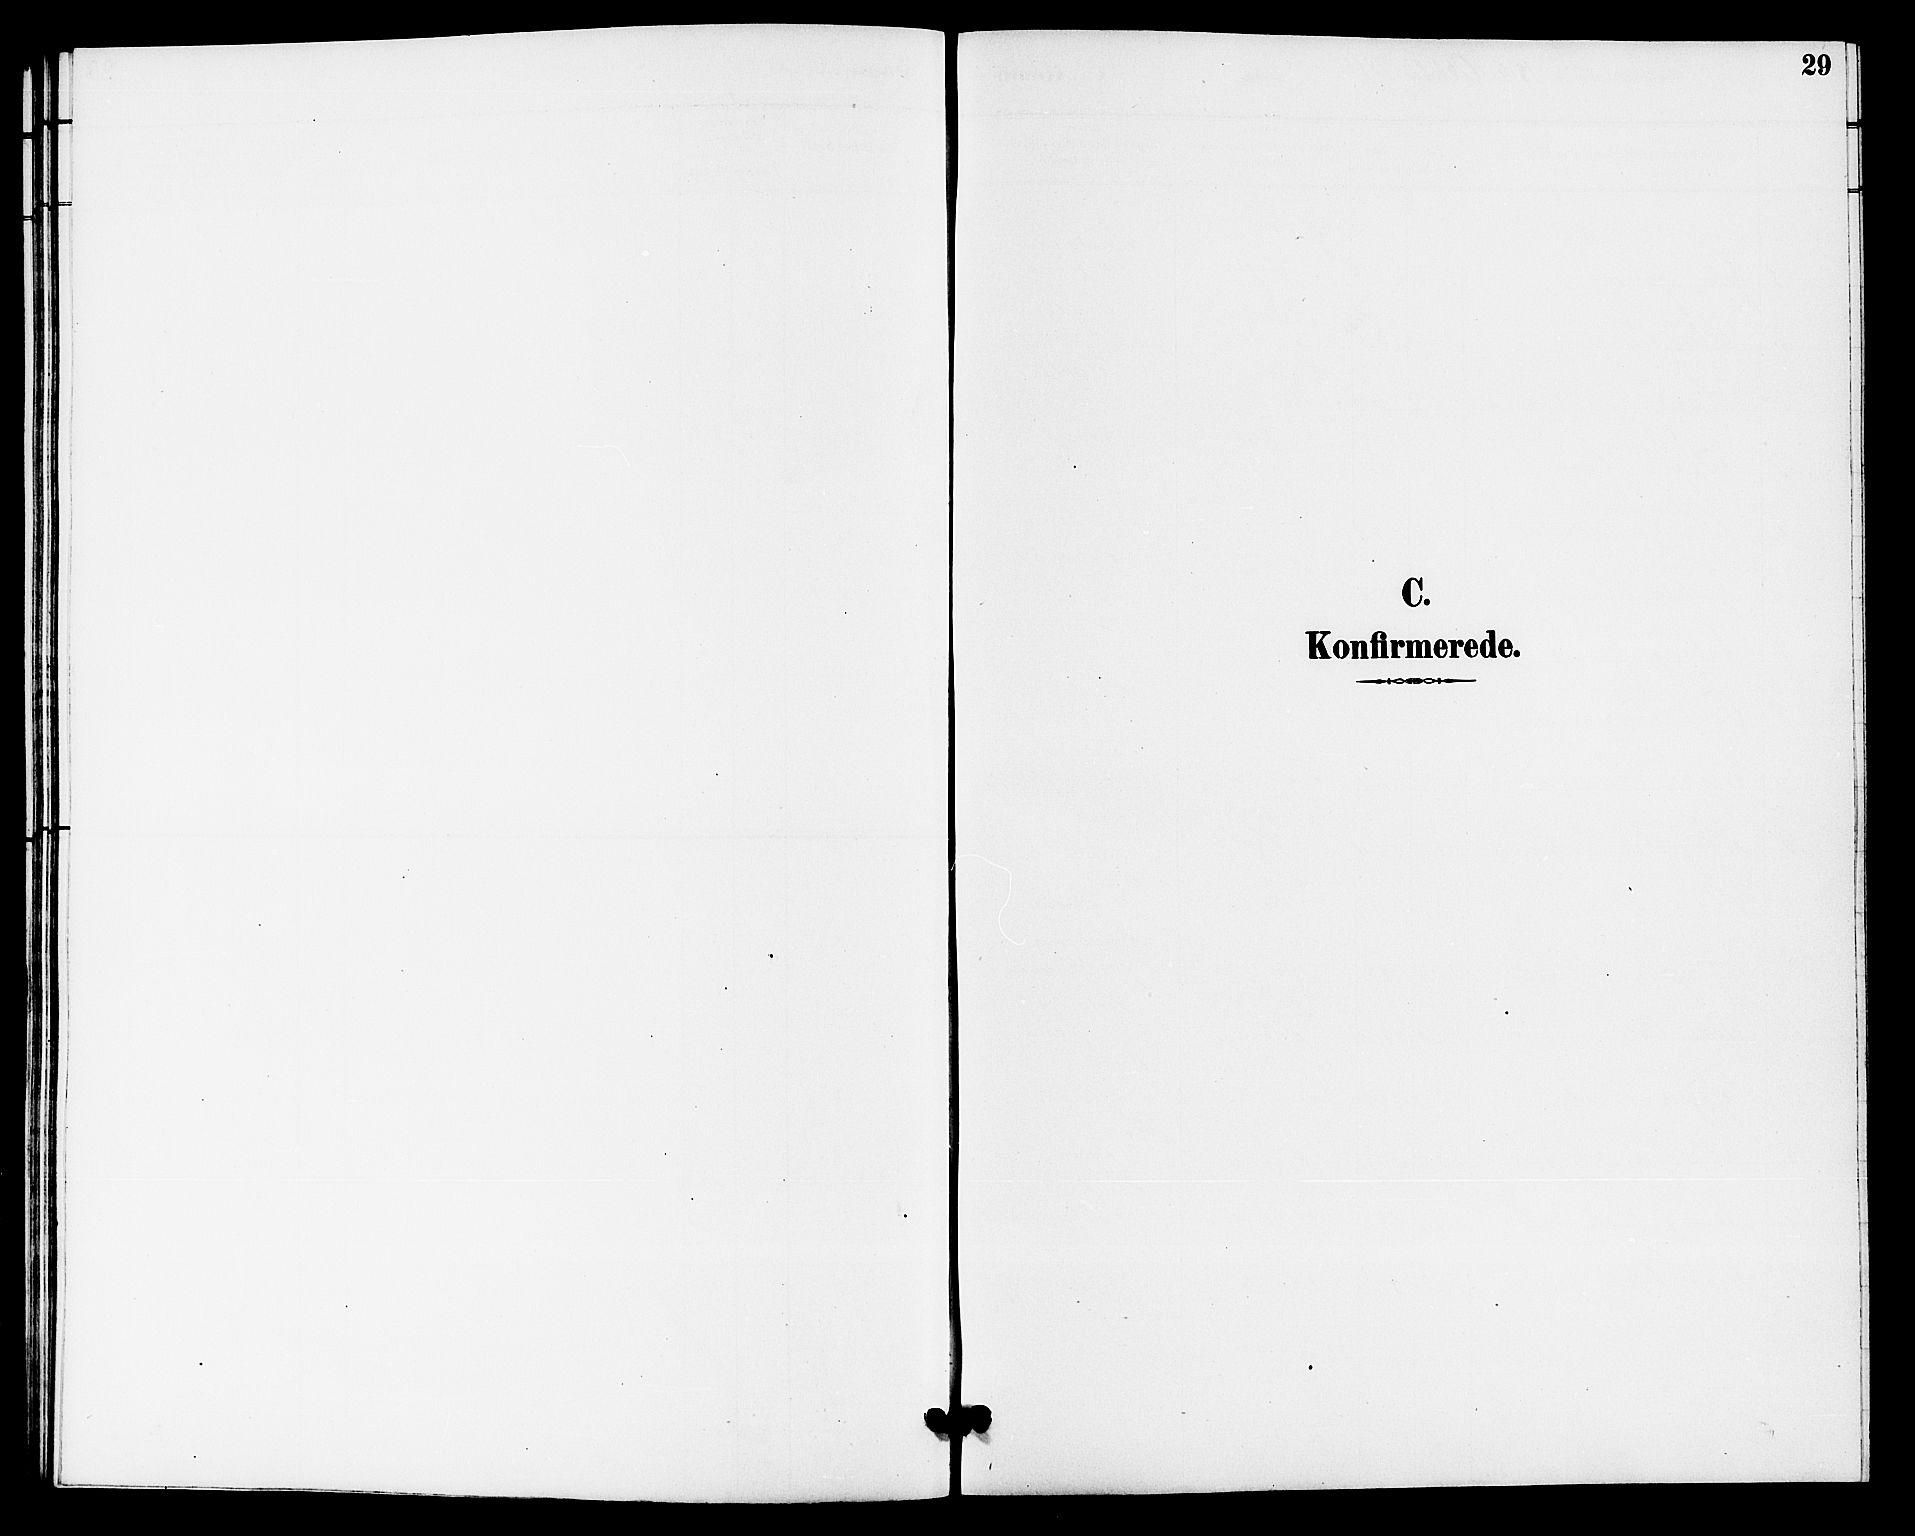 SAKO, Hjartdal kirkebøker, G/Gb/L0003: Klokkerbok nr. II 3, 1884-1899, s. 29